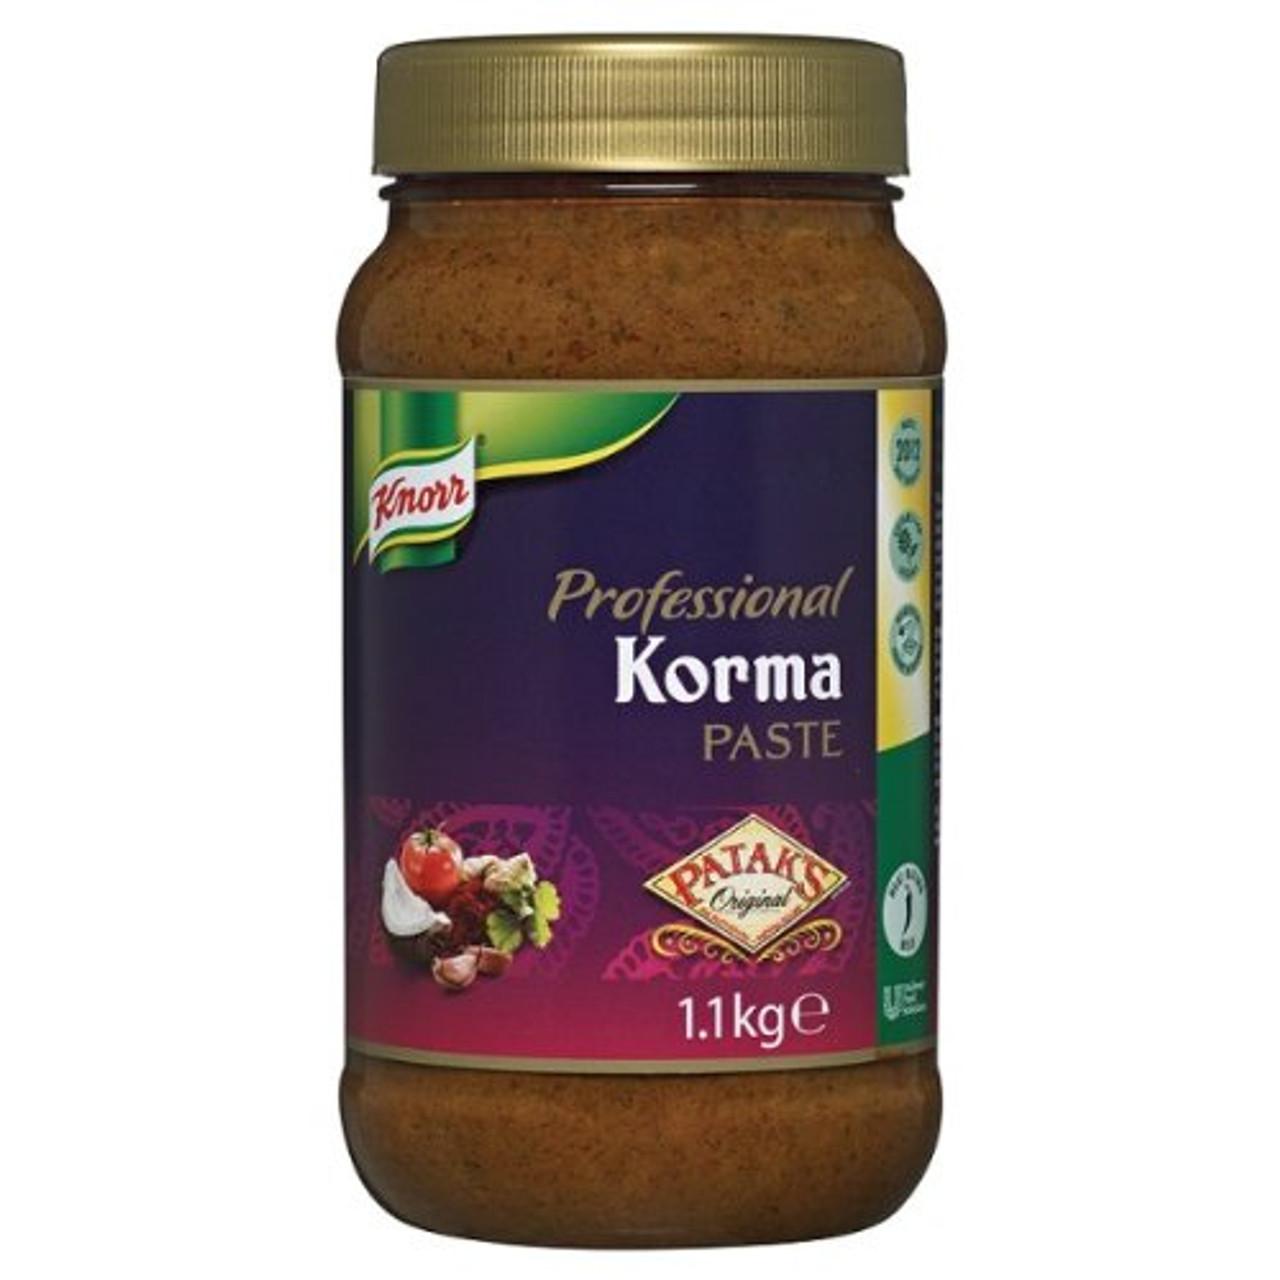 Knorr Korma Paste 1.1kg